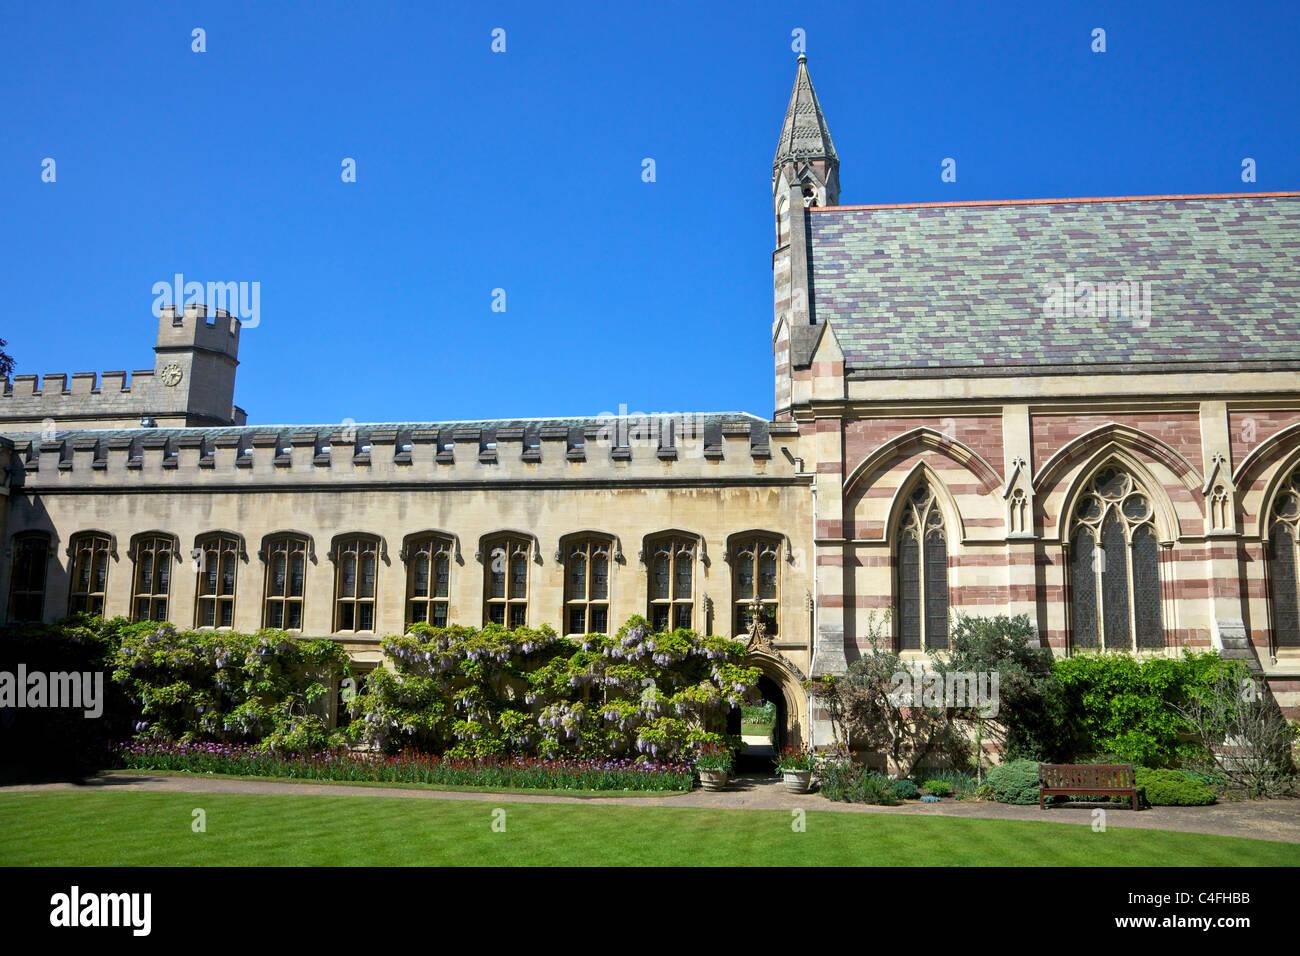 Balliol College, Oxford University, Oxfordshire, England, UK United Kingdom, GB, Great Britain, British Isles, Europe, - Stock Image